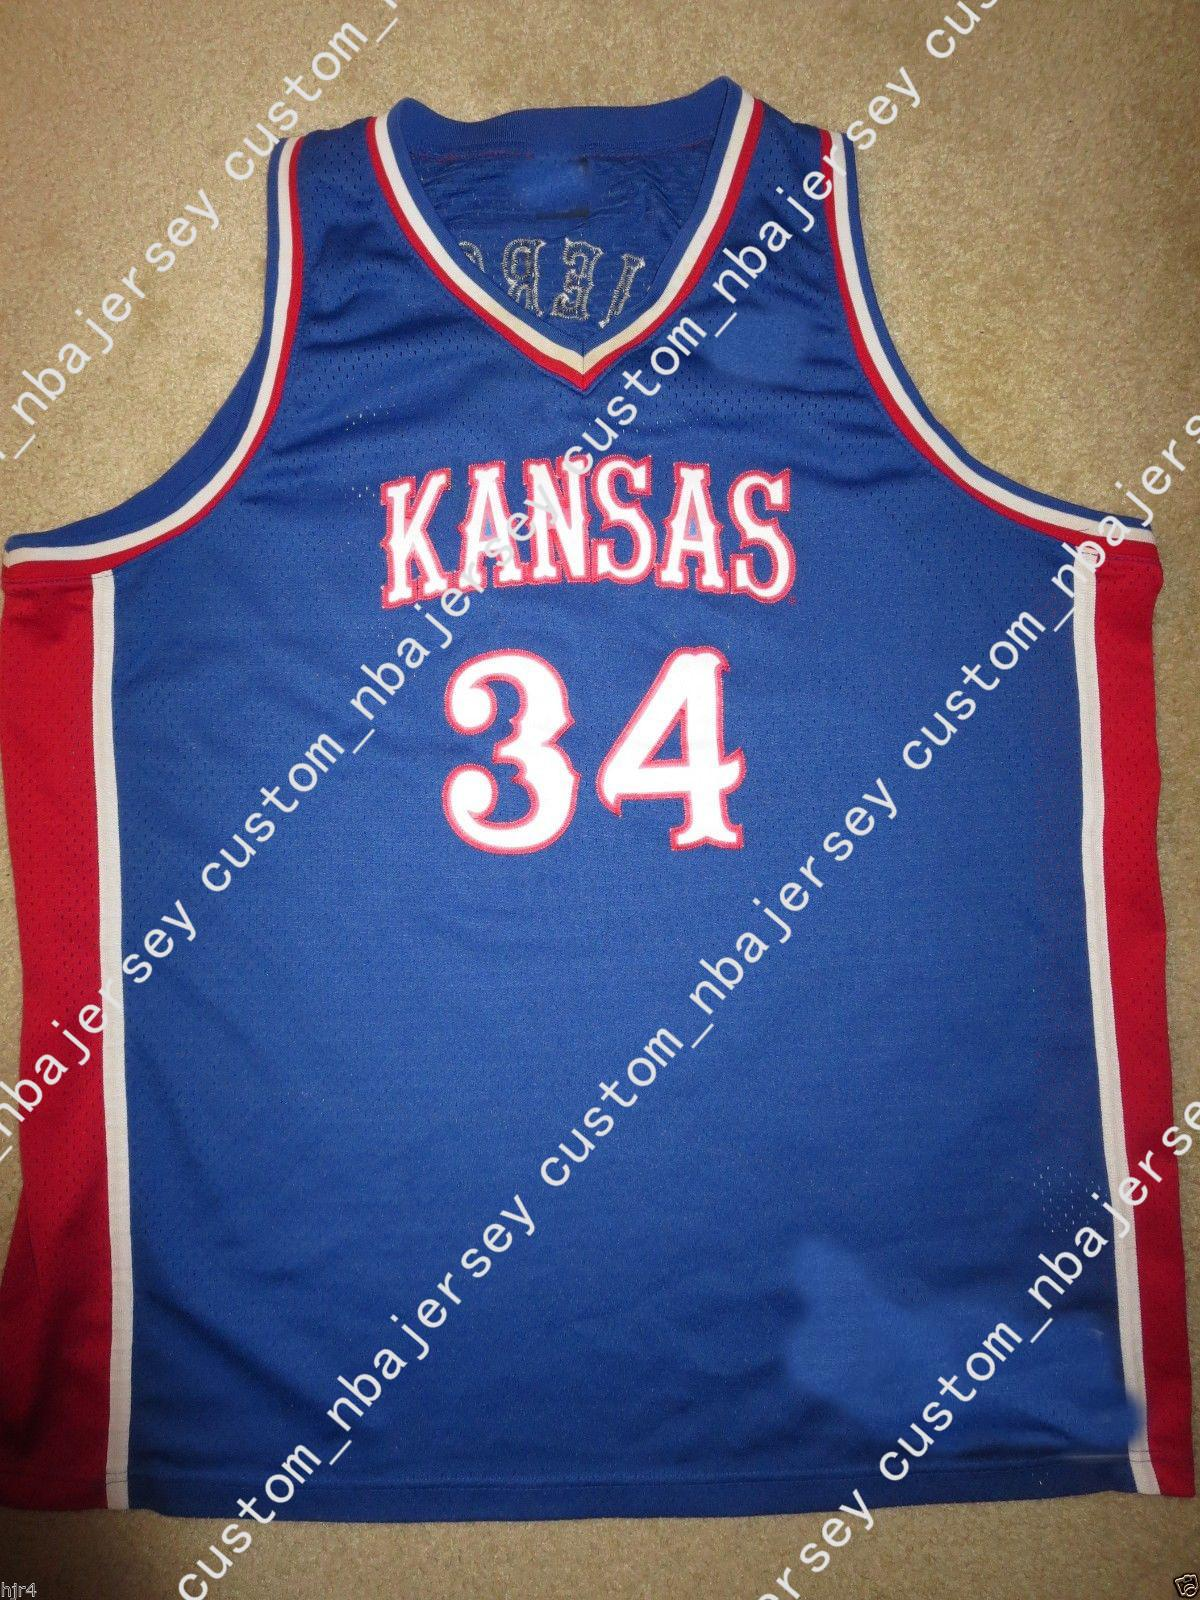 5bbb3e6e3b2 2019 Cheap Custom Paul Pierce #34 Kansas Jayhawks NCAA 1995 Rewind Jersey  Stitched Customize Any Number Name MEN WOMEN YOUTH XS 5XL From  Custom_nbajersey, ...